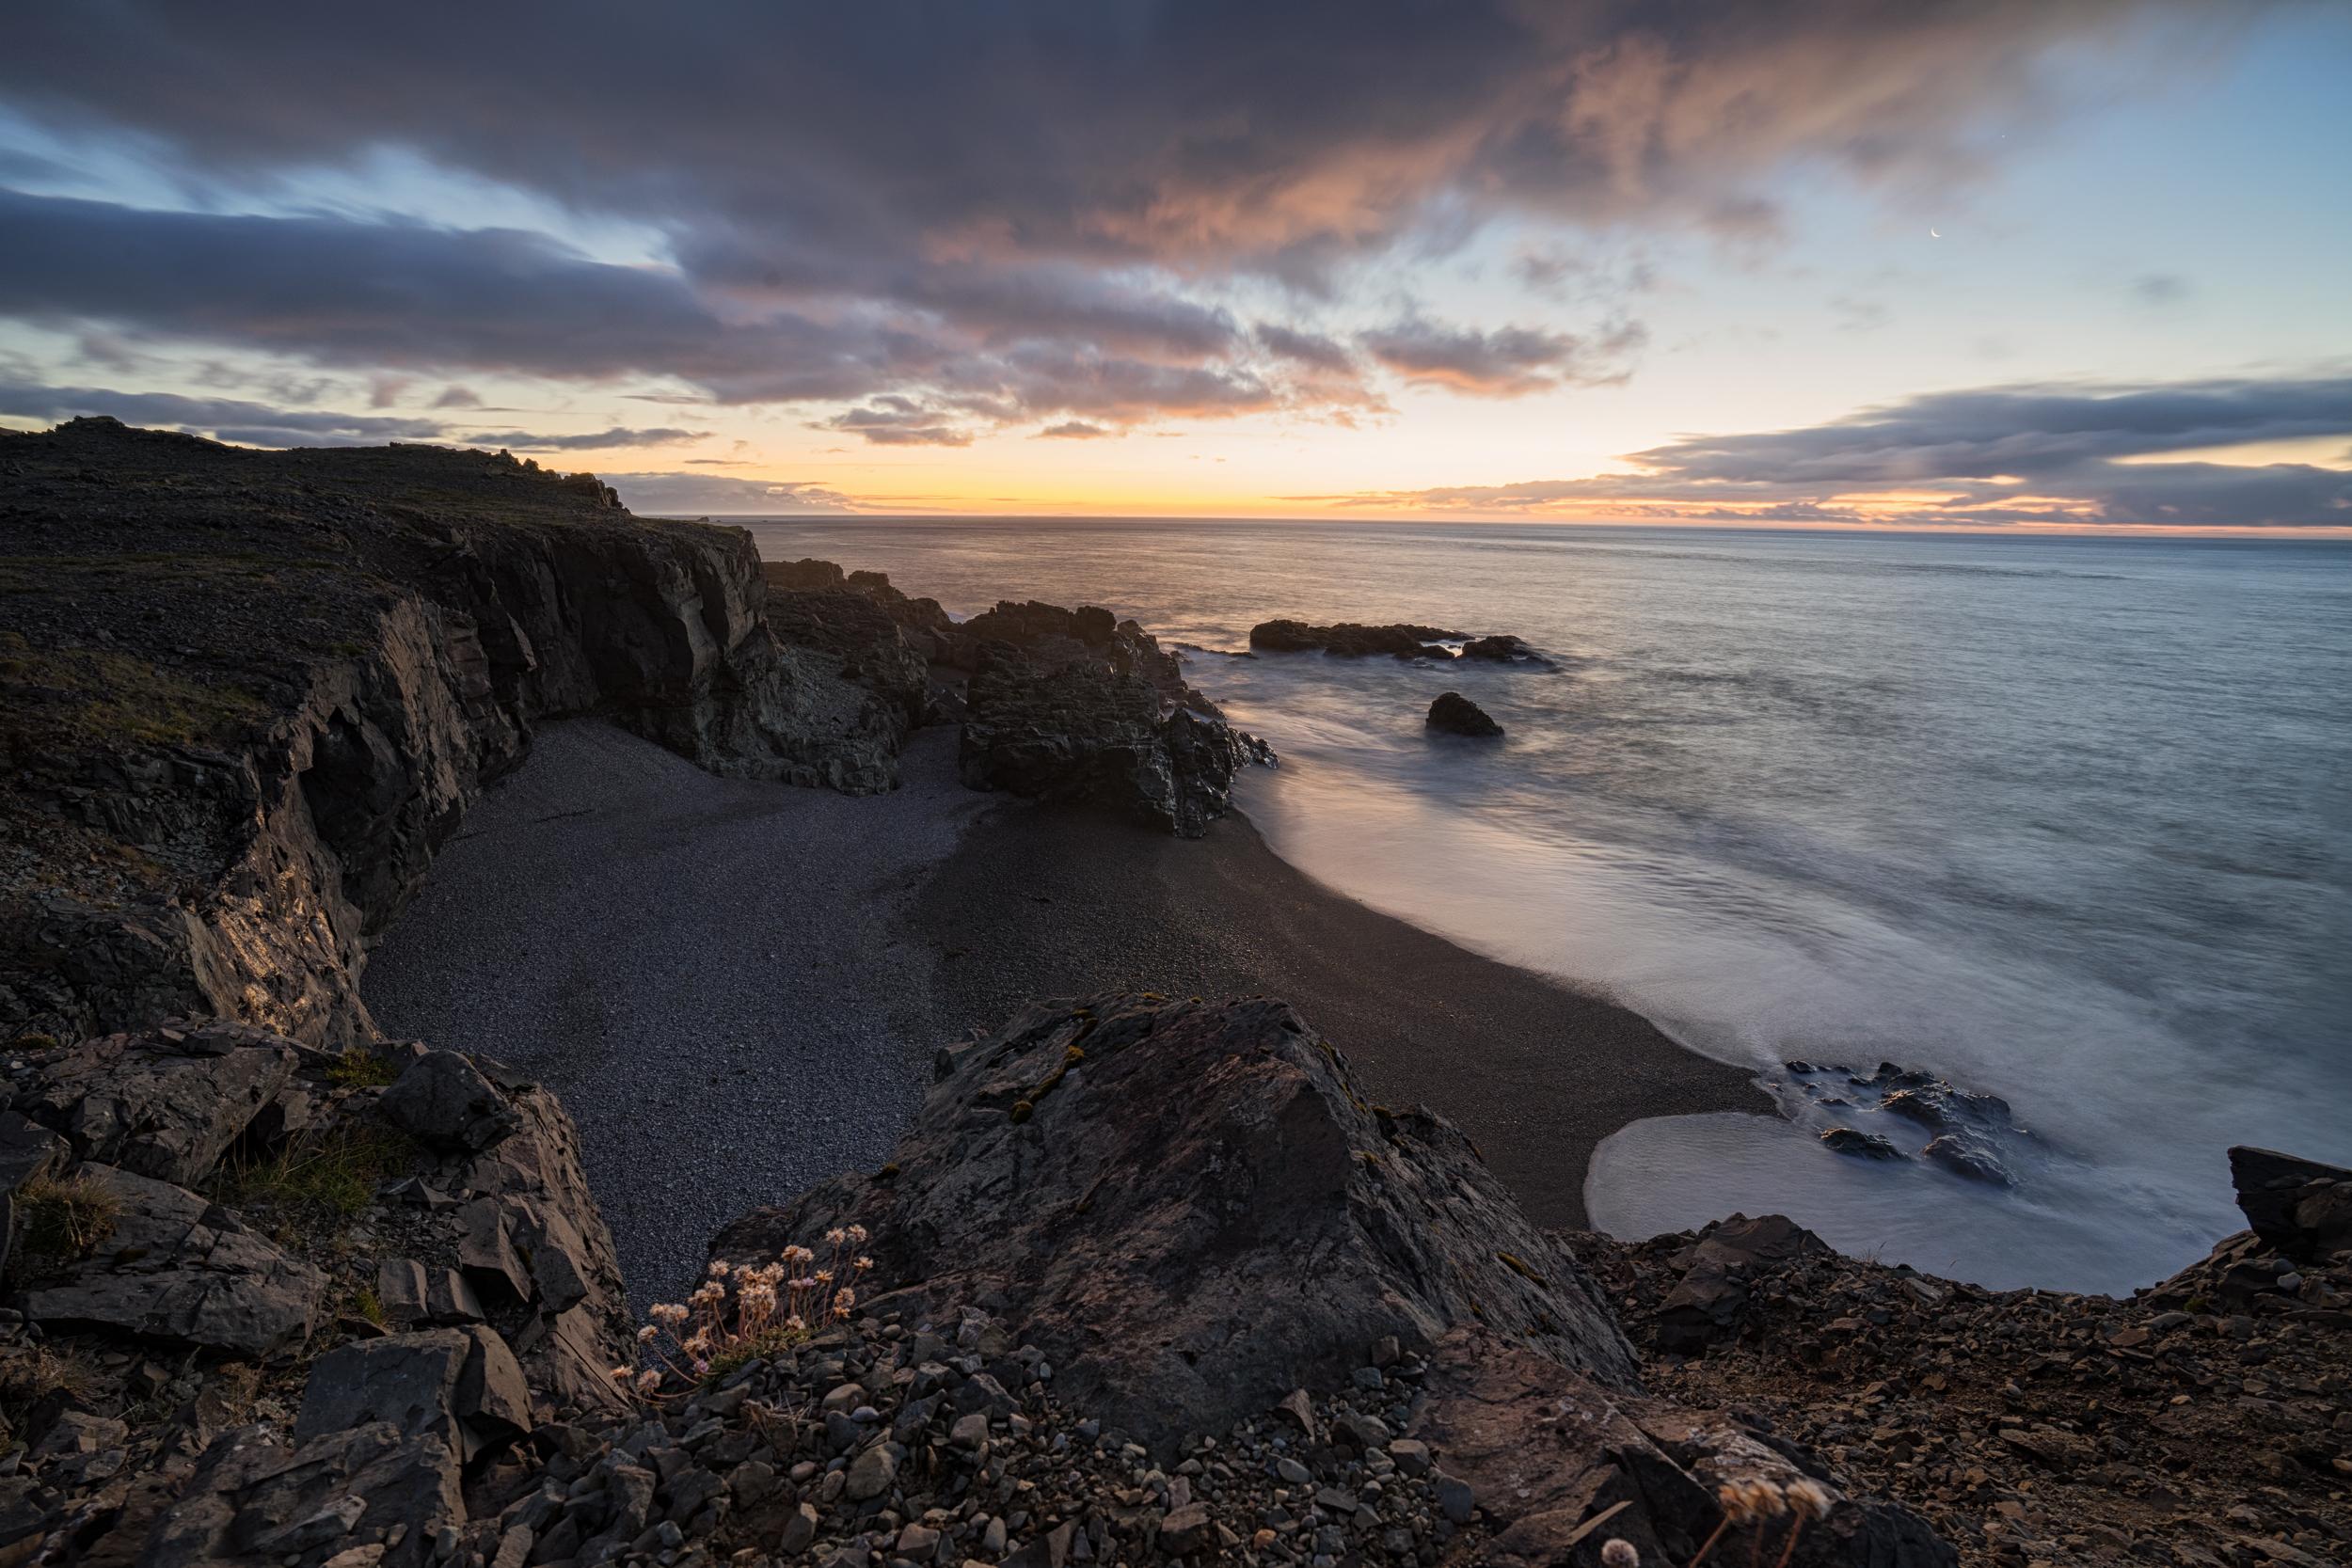 Iceland - 00608-2-HDR_ME-2 - Chris Goetchius 2017 - WEB UPLOAD ONLY.jpg